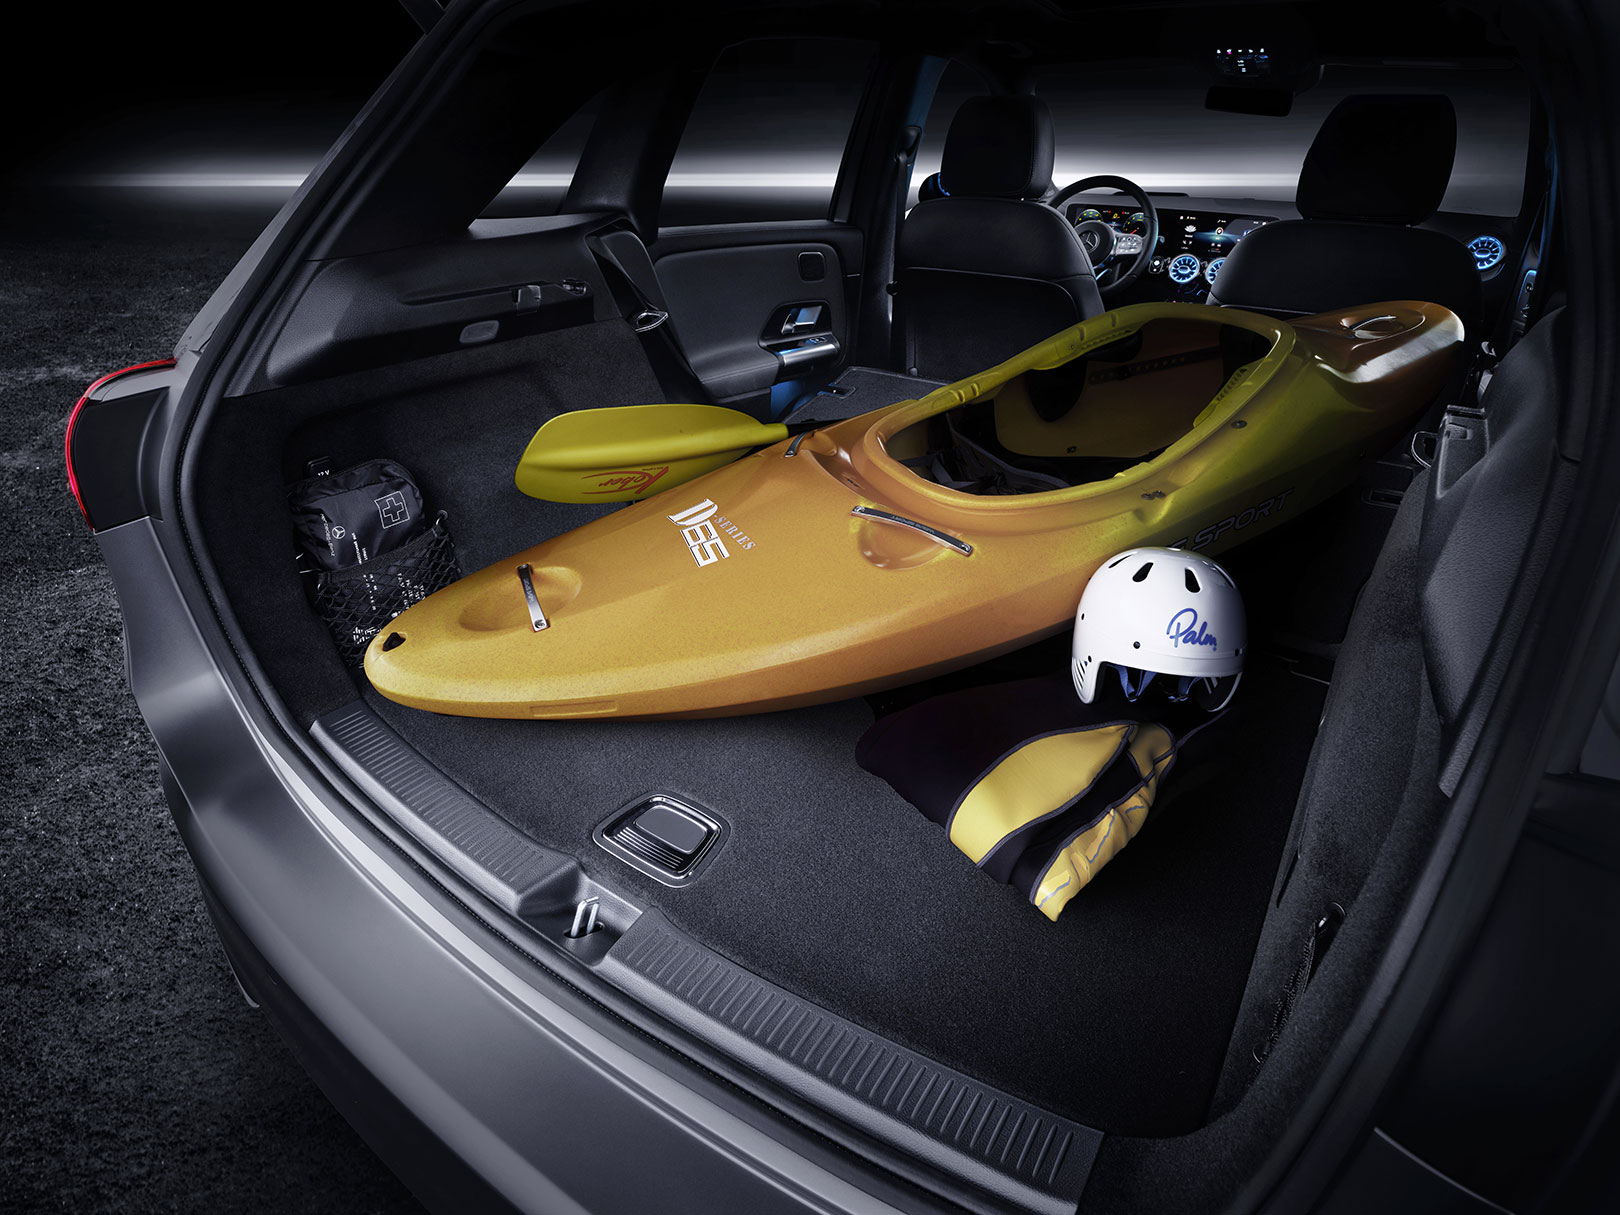 Essai auto Trajectoire magazine : Mercedes Classe B